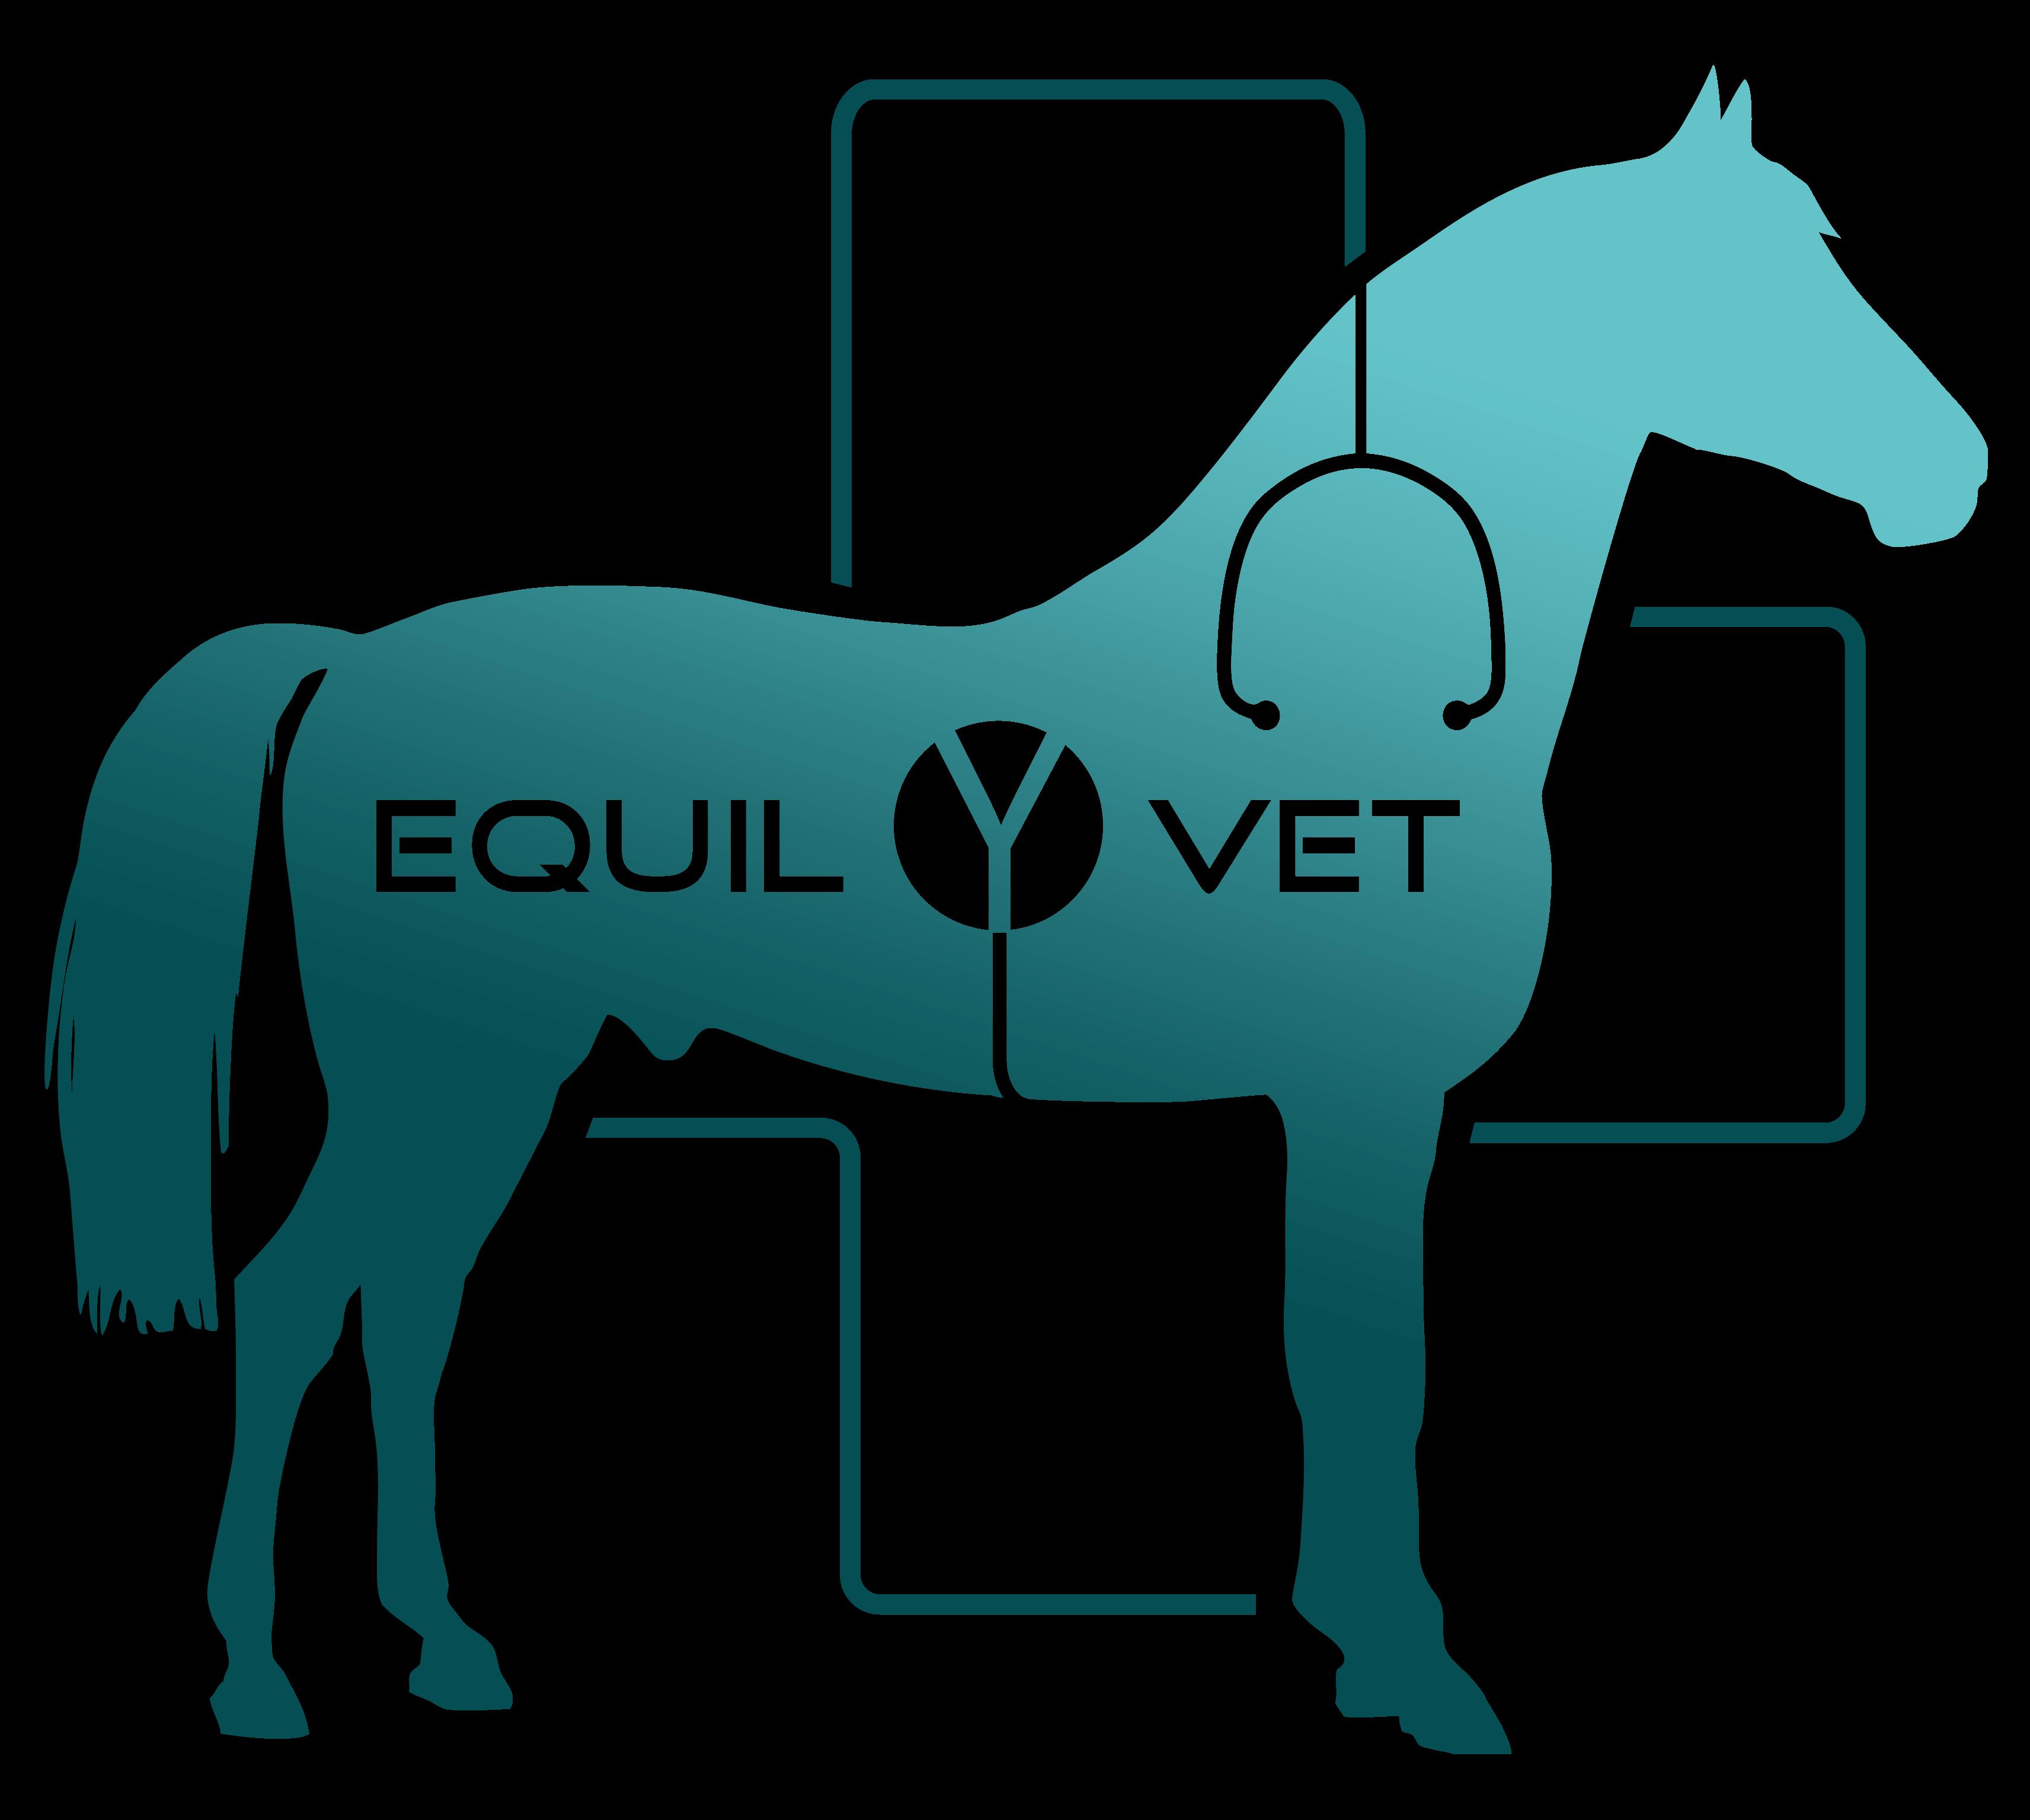 Equilyvet